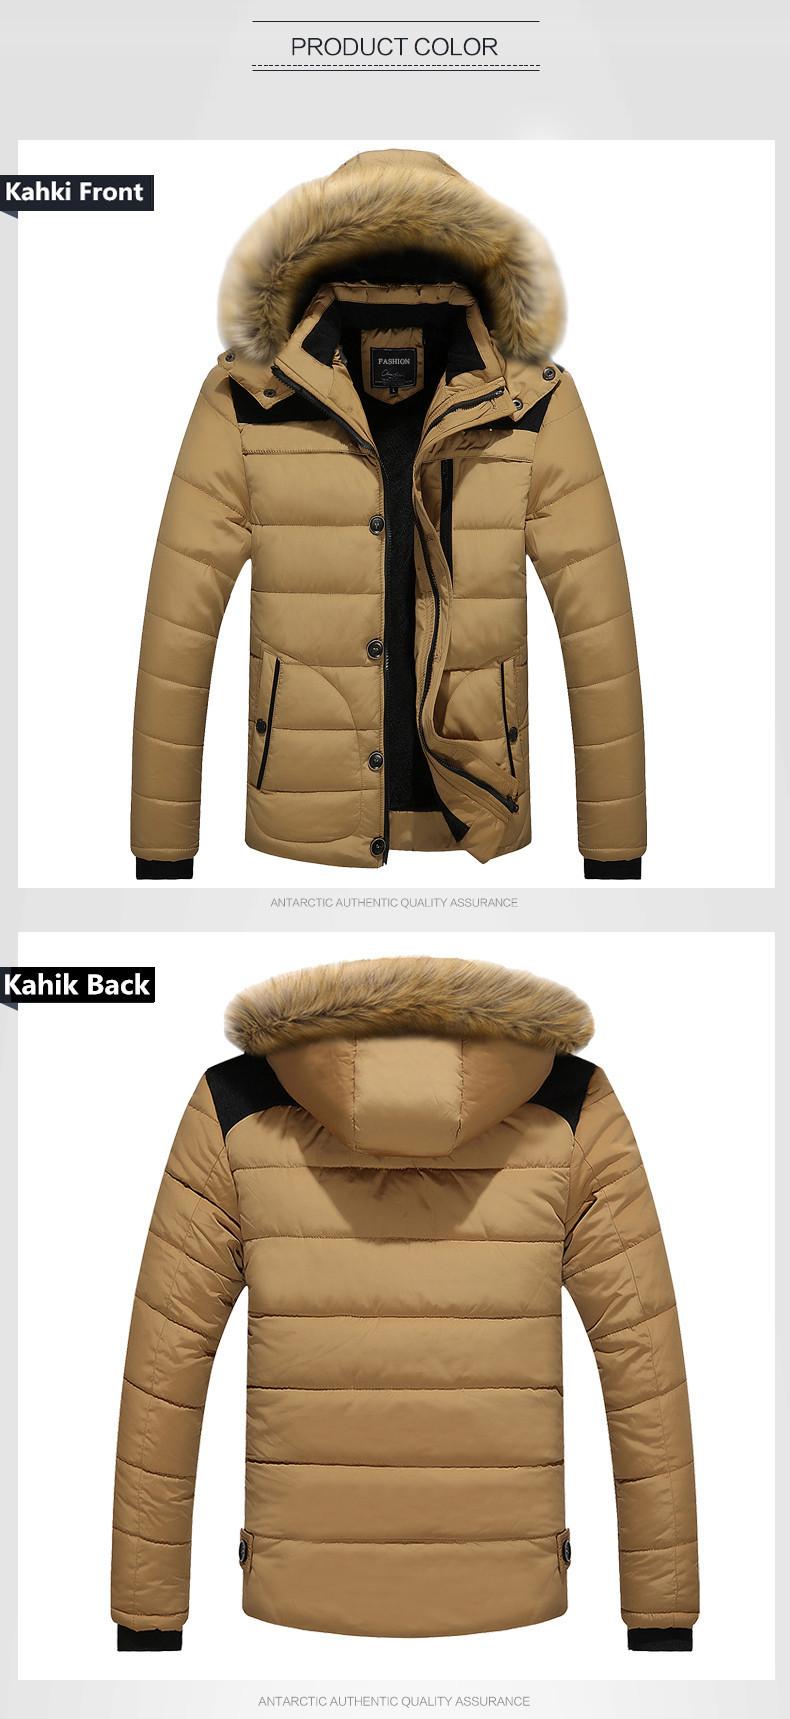 W102 2016 Mens Winter Jackets Coats Outwear Warm Down Jacket Thick Outdoor Hoodie Fox Fur Men\`s Parka Plus Size 4XL Famous Brand (8)